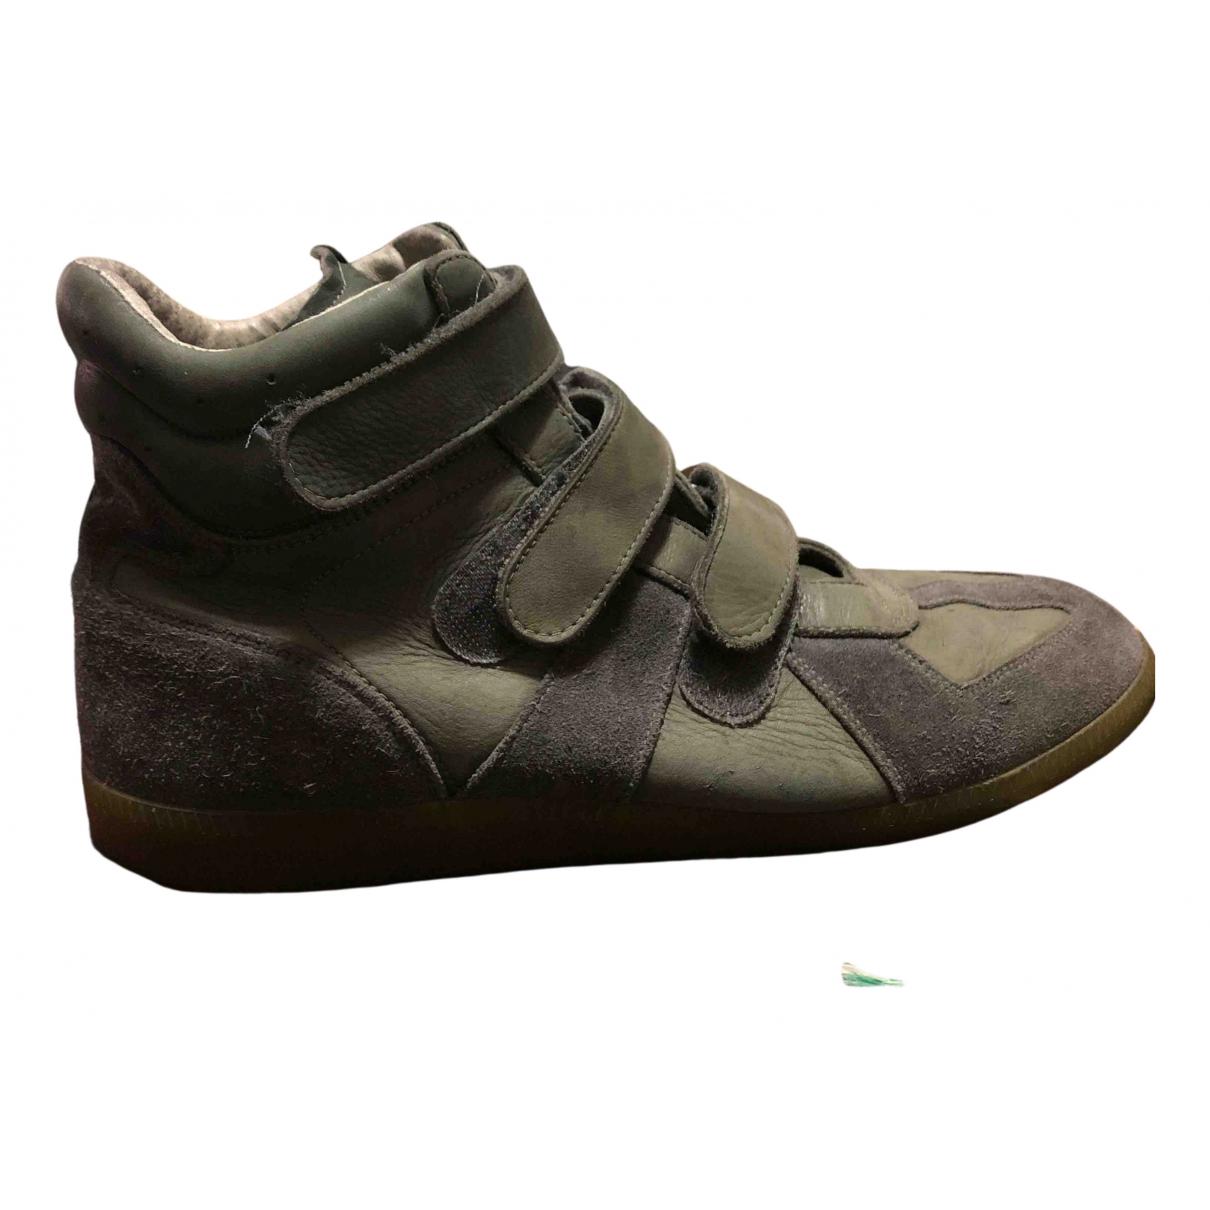 Maison Martin Margiela \N Sneakers in  Gruen Leder